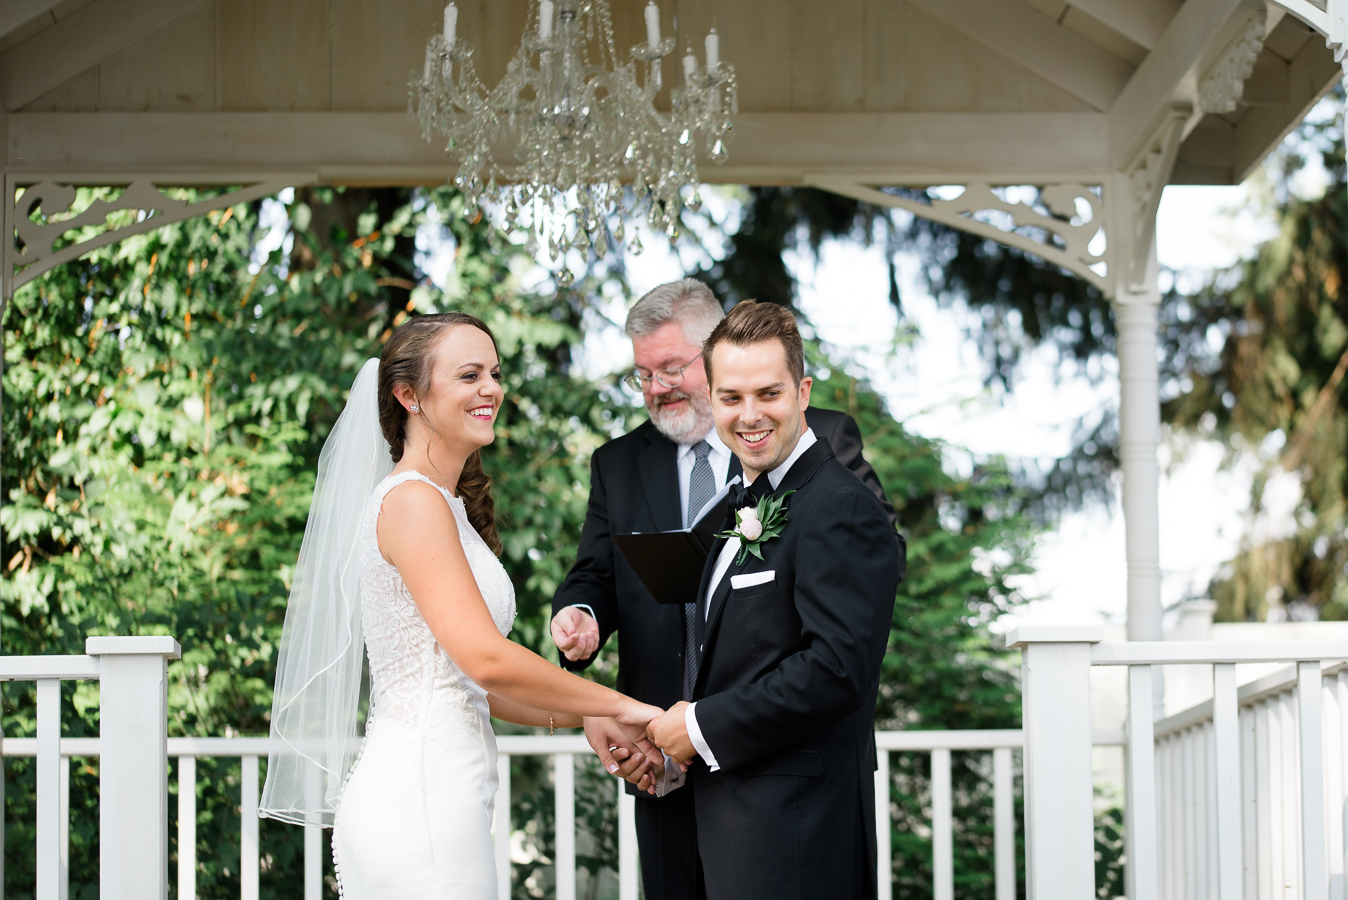 priestley savidge house weddings and events